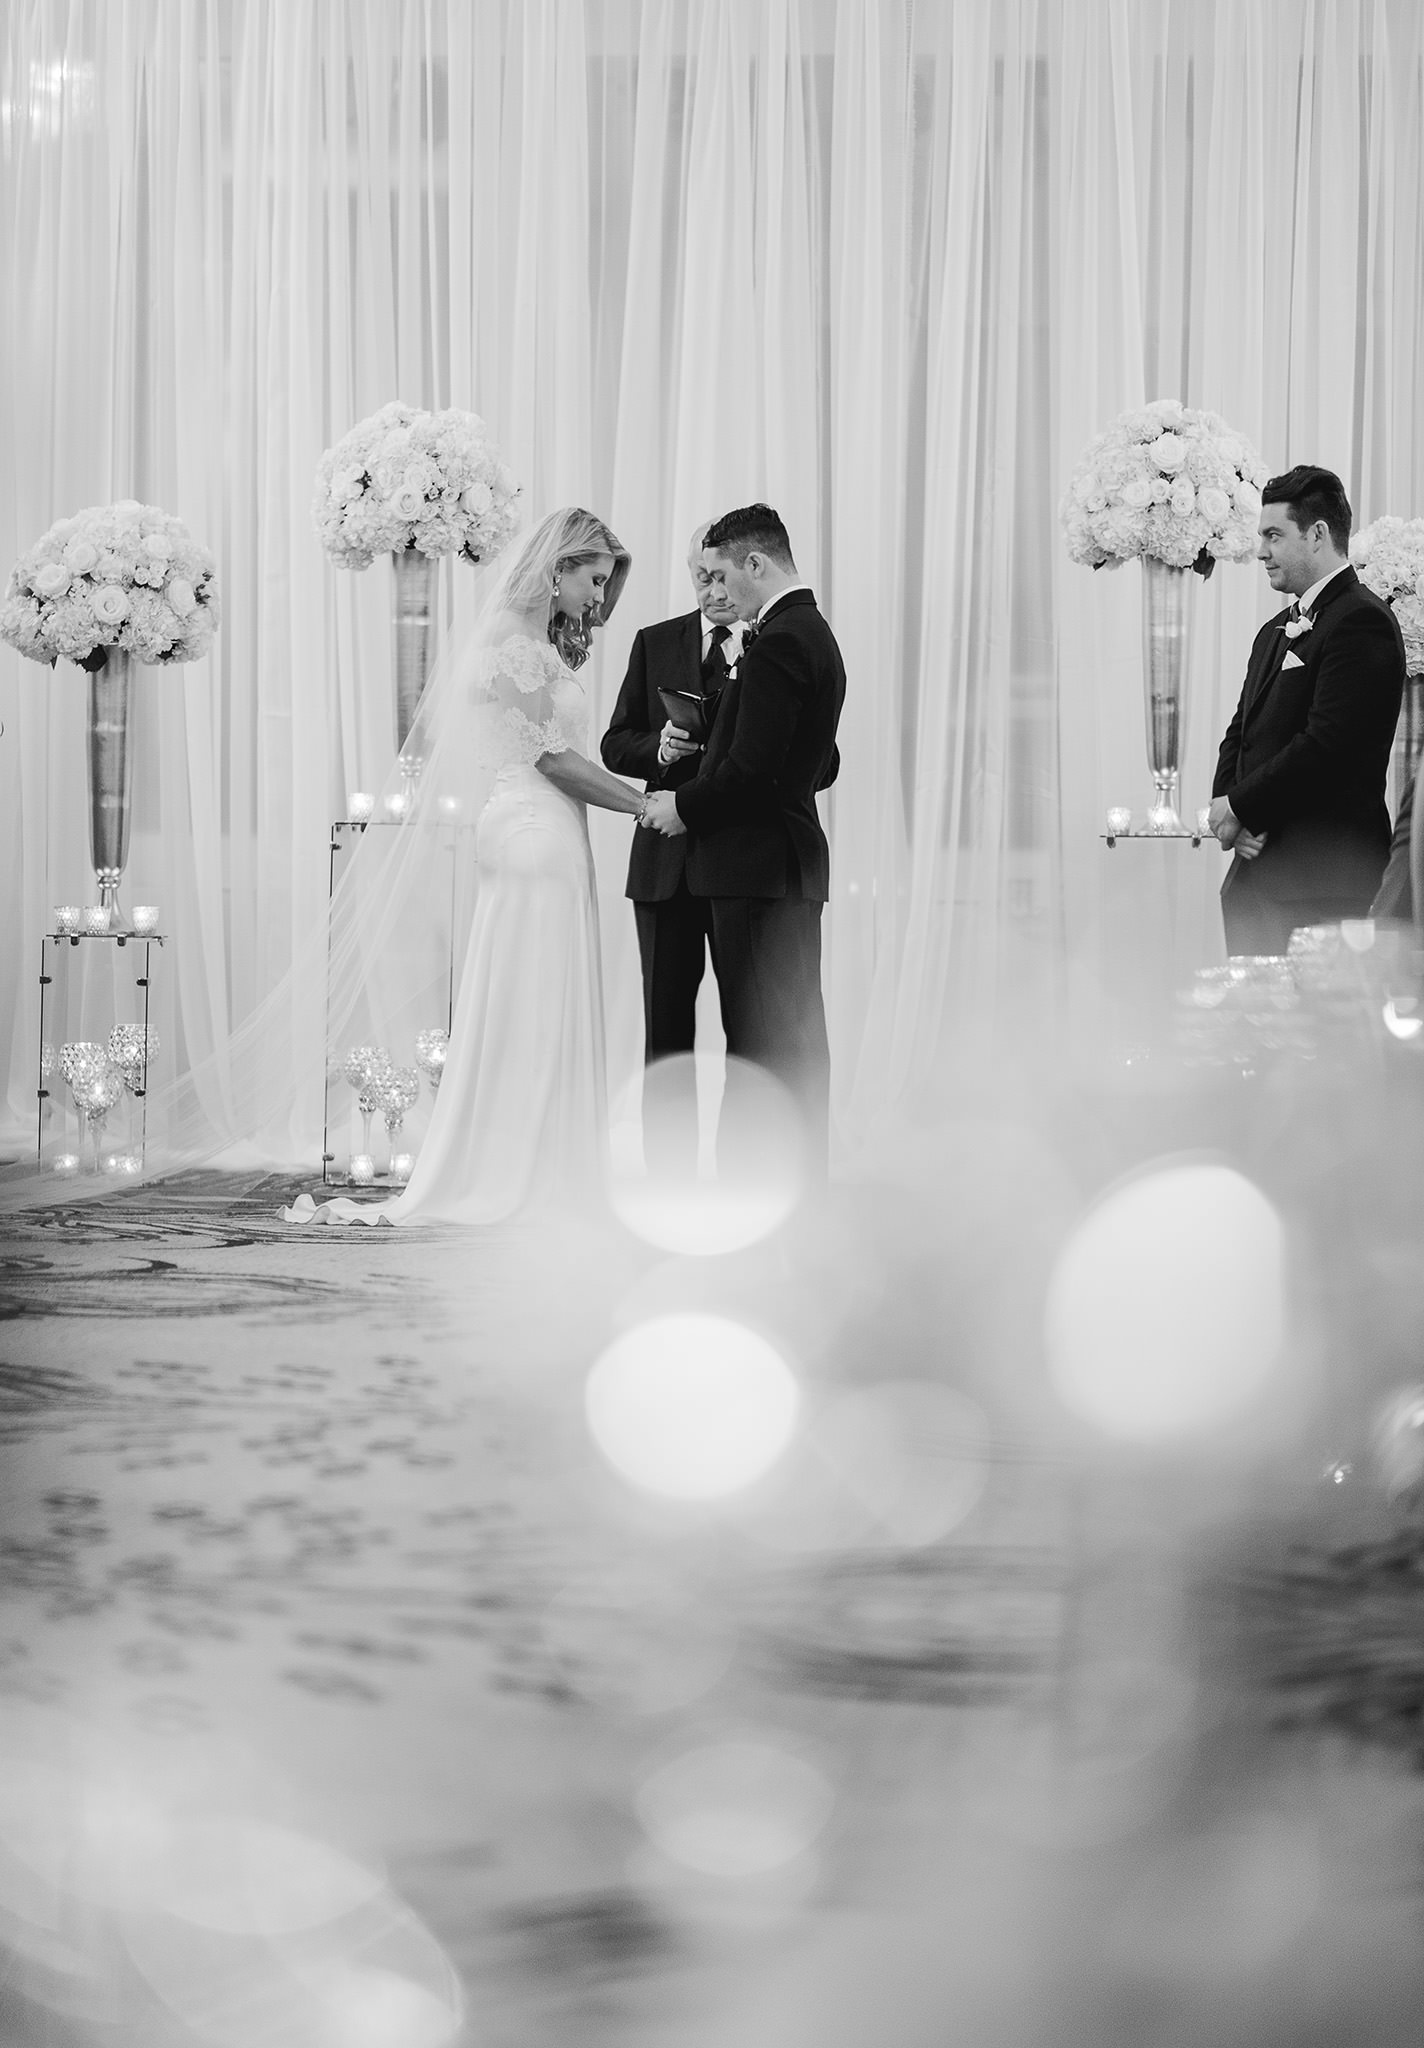 Claire-Travis-Classy-artistic-Downtown-Houston-Rice-ballroom-wedding-sm-020.jpg